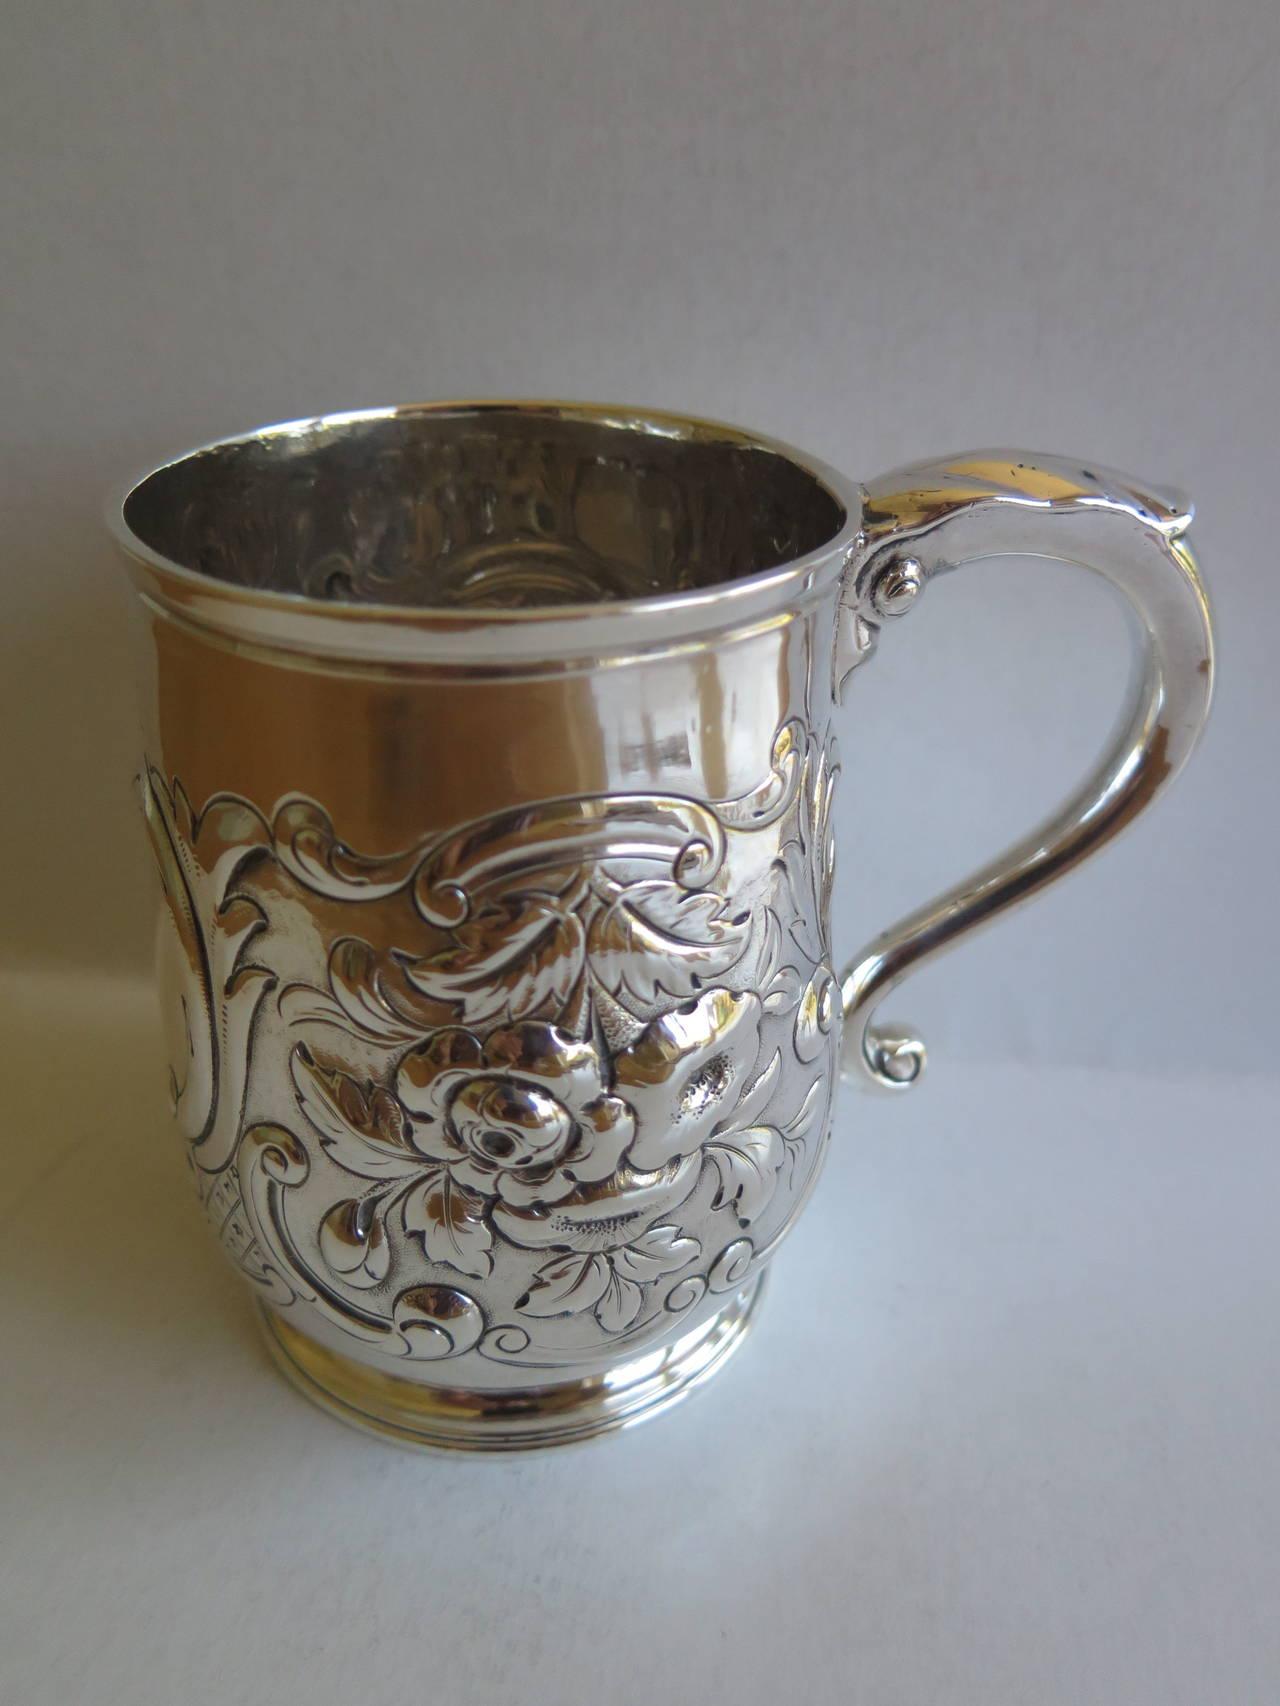 Rare Irish George II Silver Mug or Tankard by John Moore, Dublin 1740 6